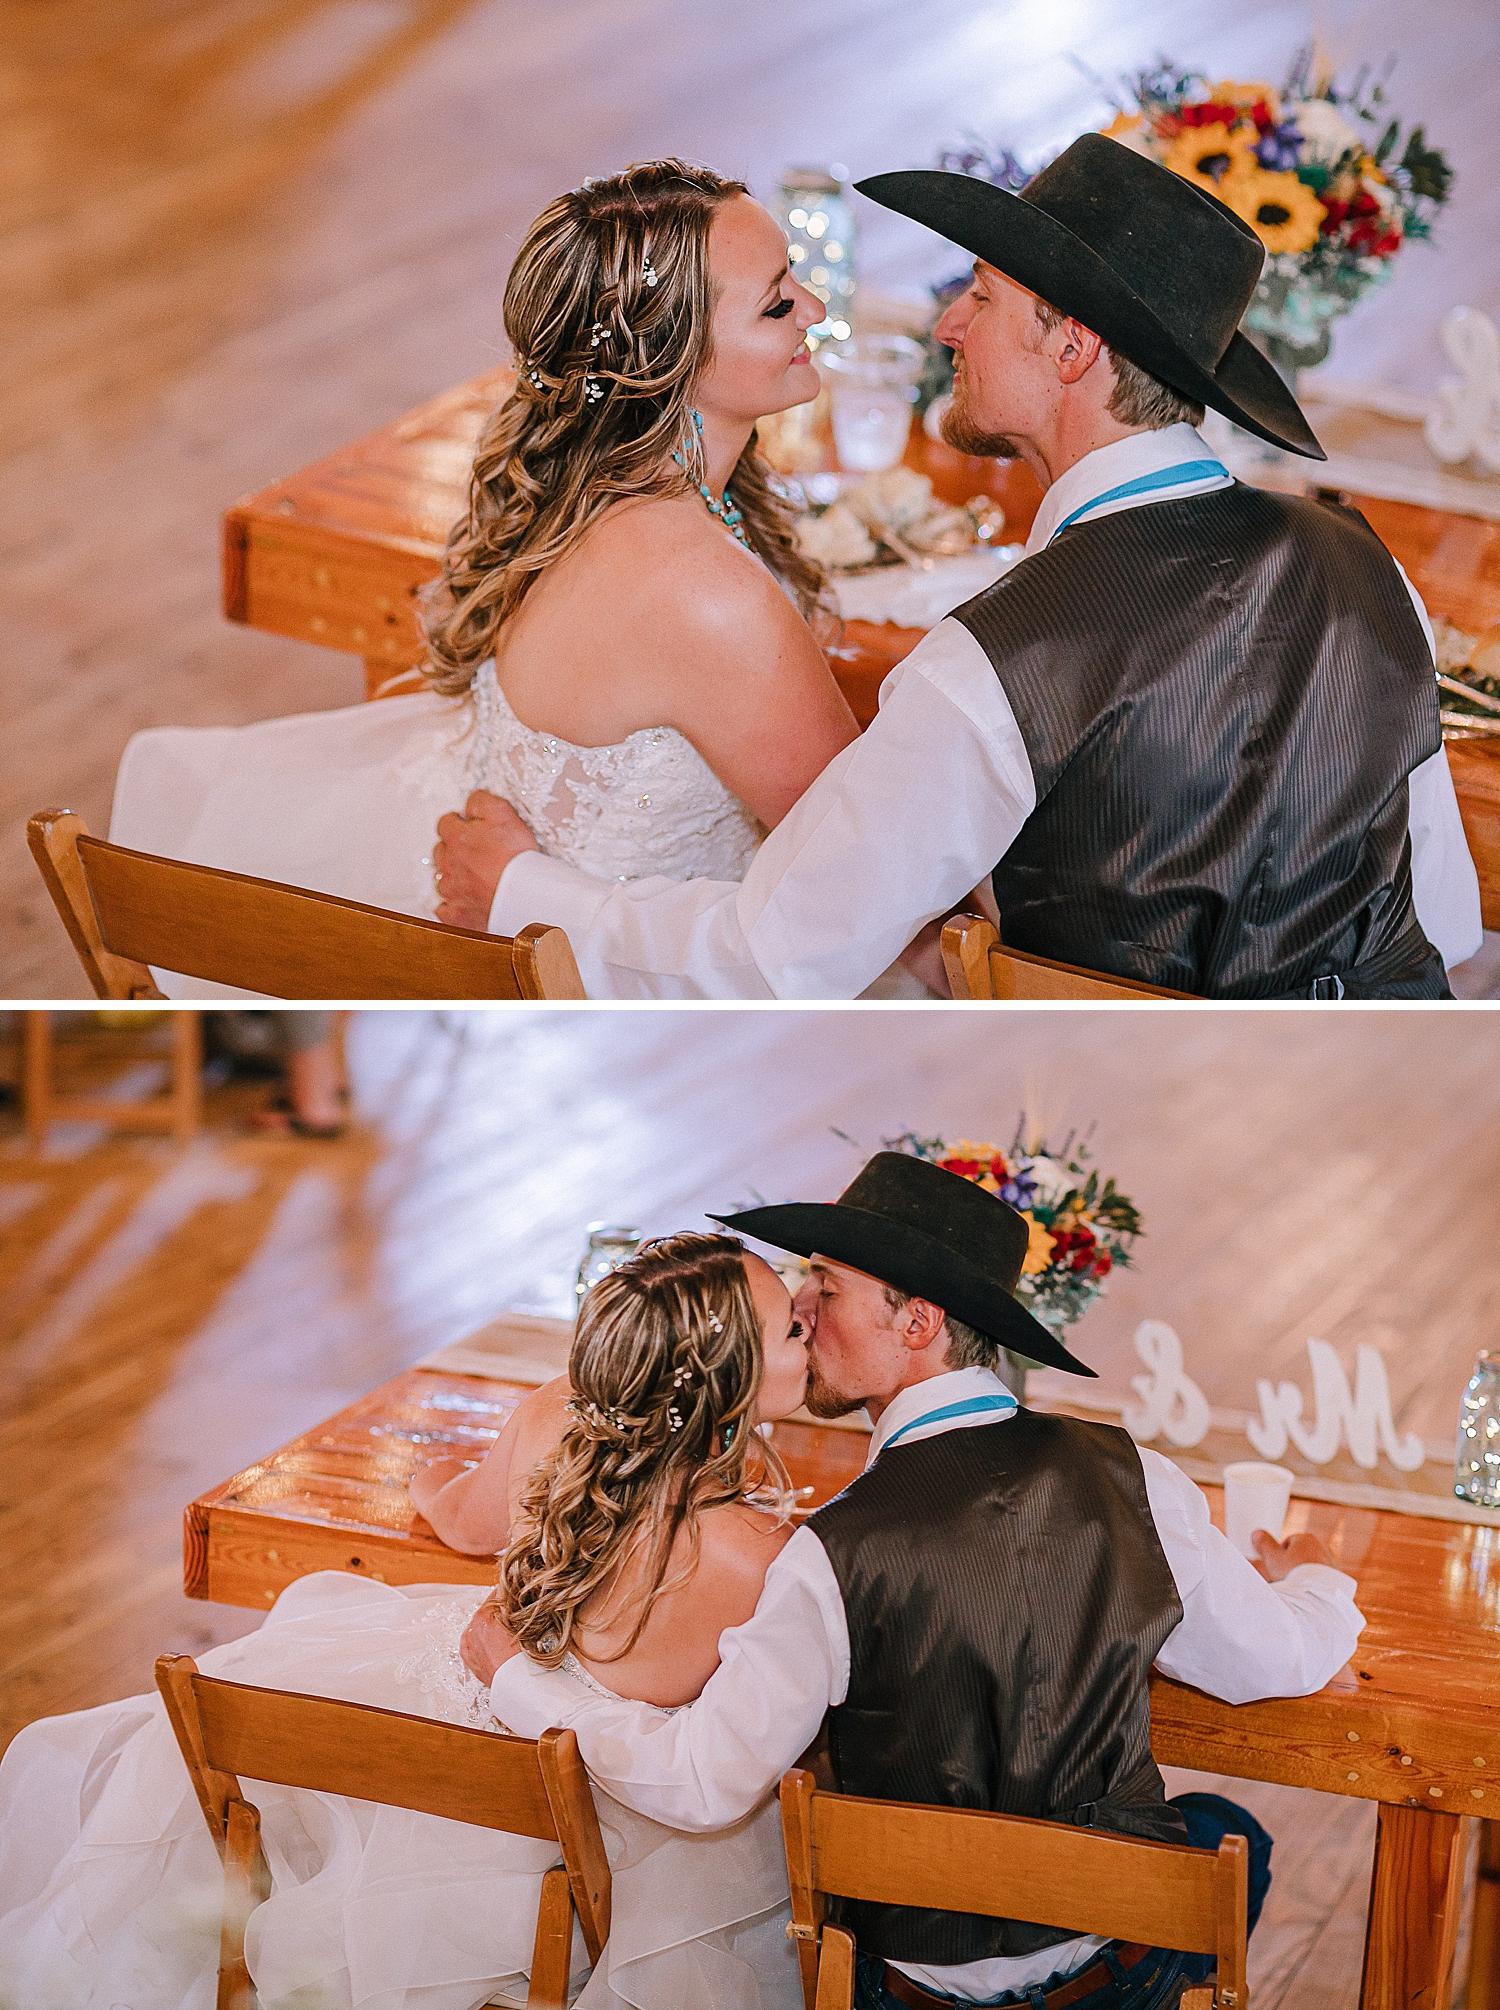 Carly-Barton-Photography-Old-Town-Texas-Rustic-Wedding-Photos-Sunflowers-Boots-Kyle-Texas_0087.jpg